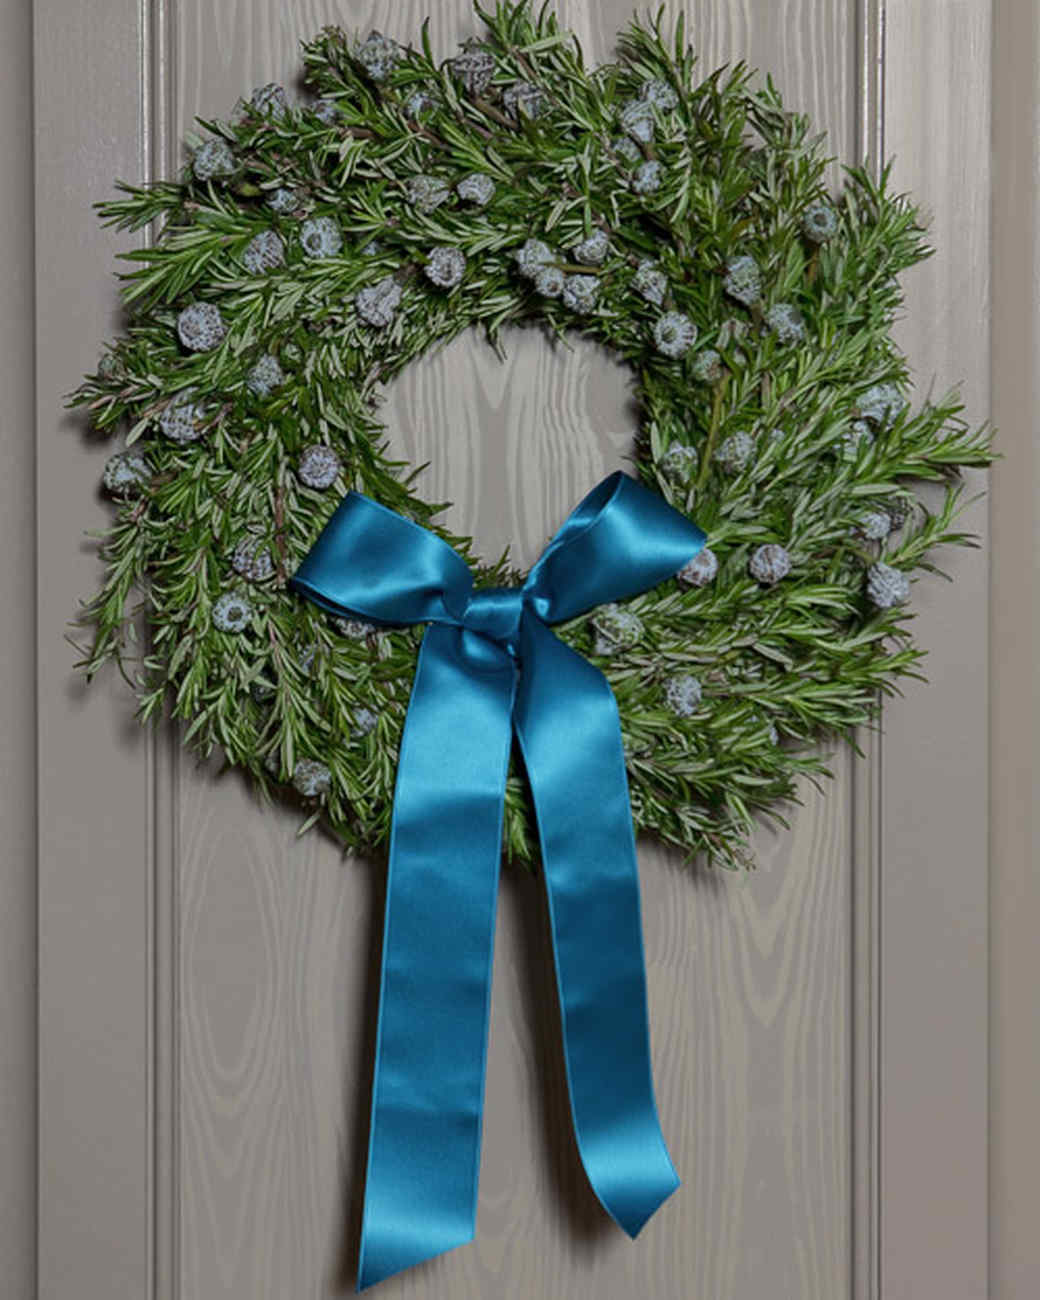 Fragrant Wreathes